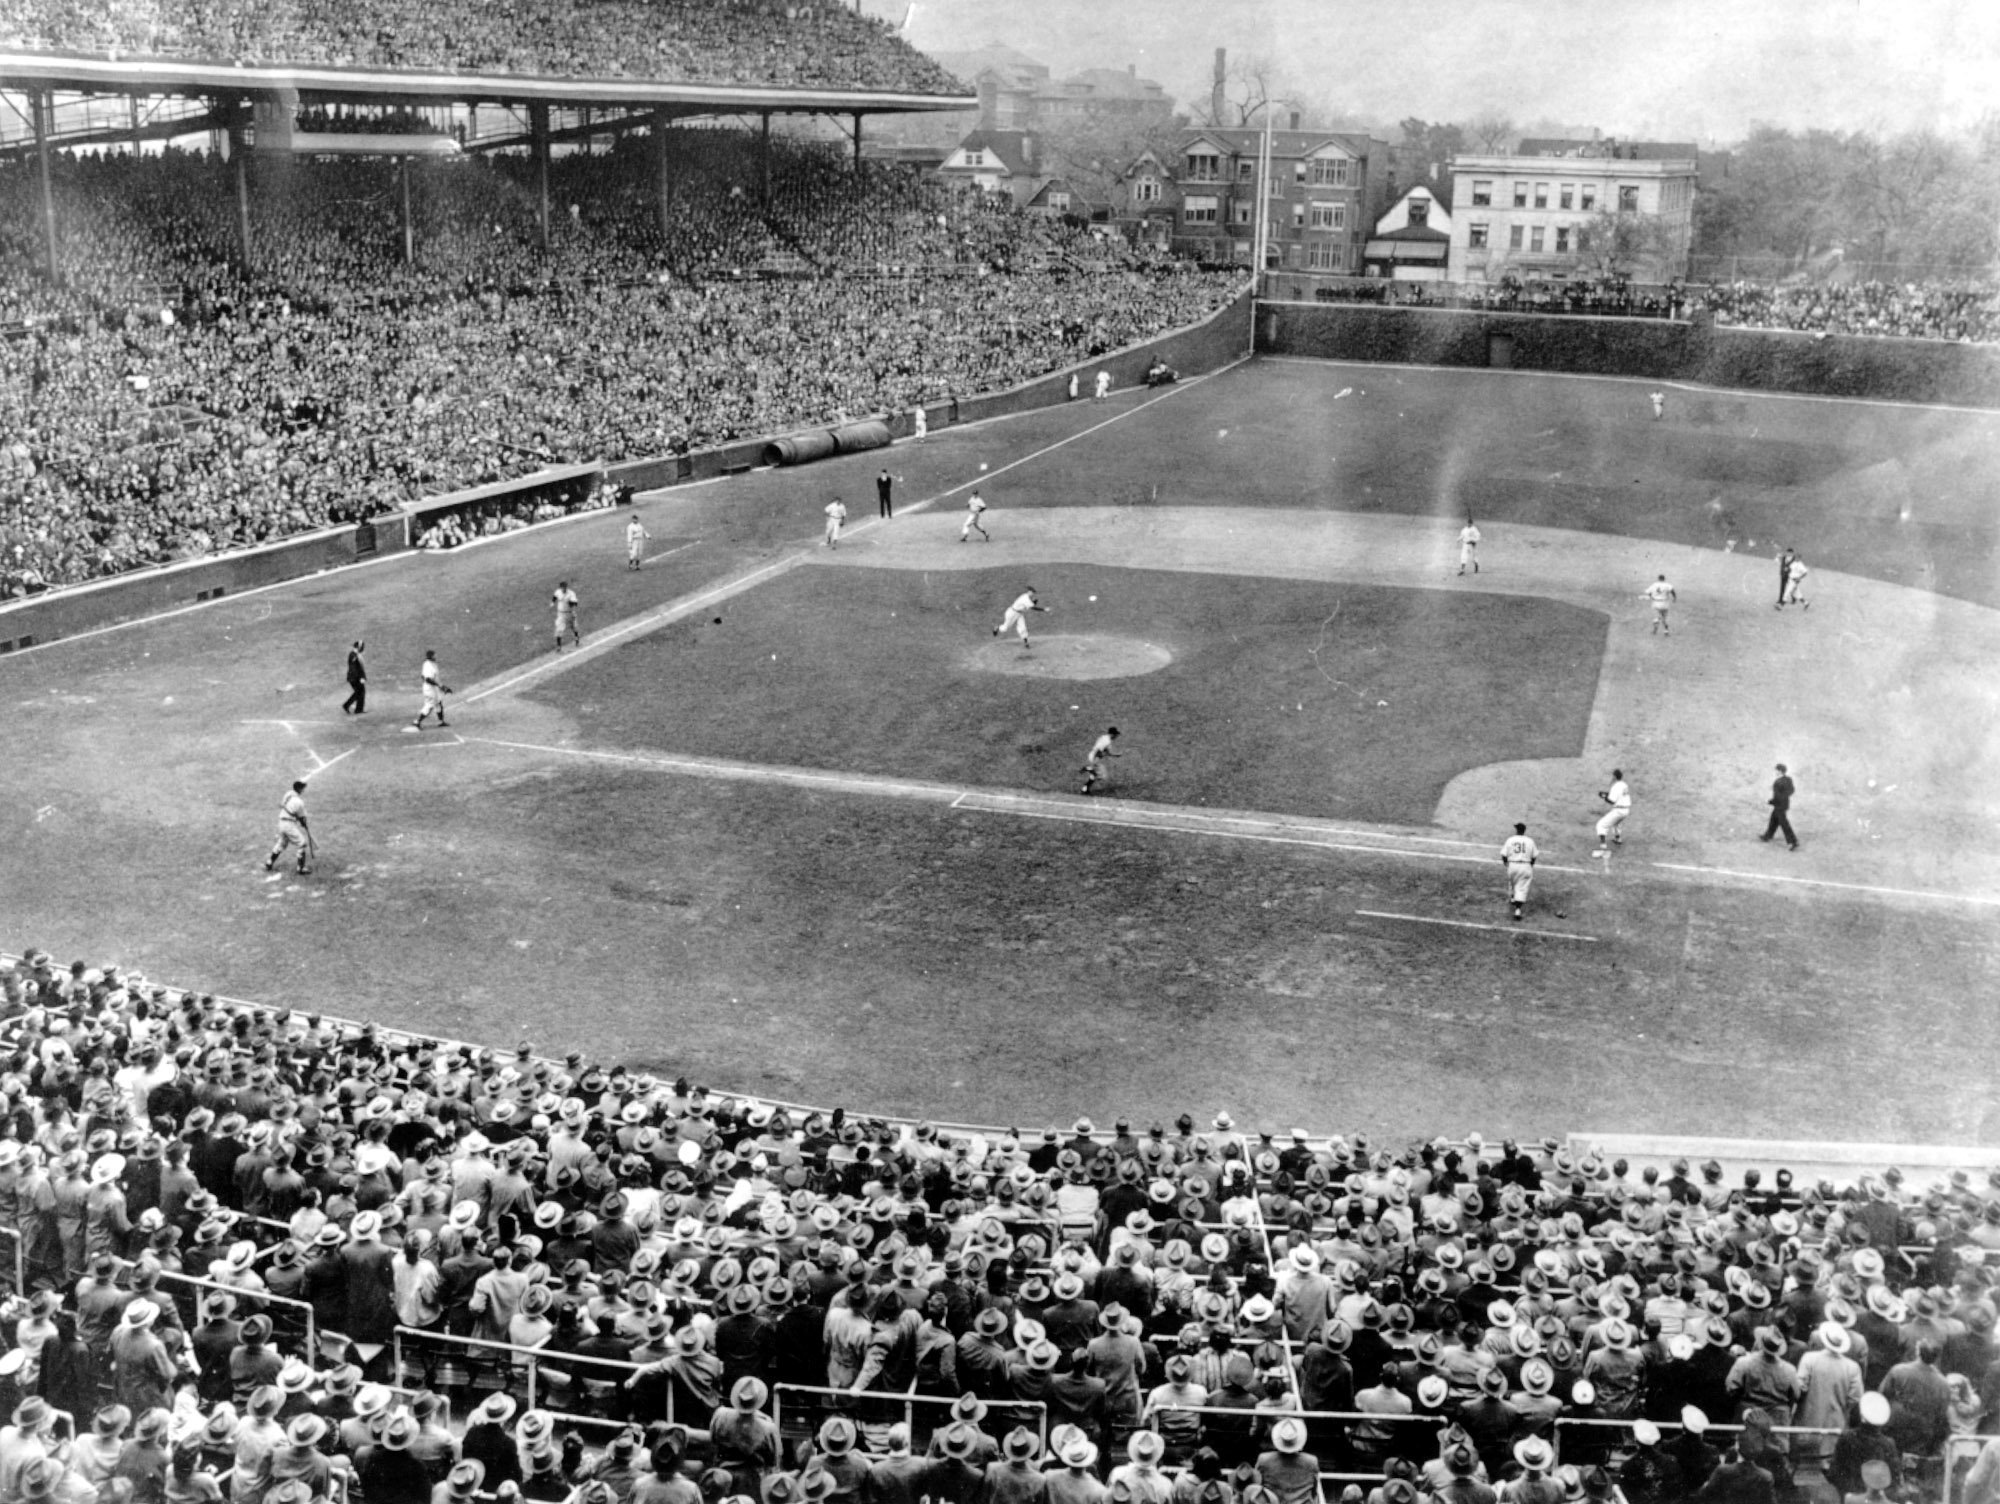 1945 World Series